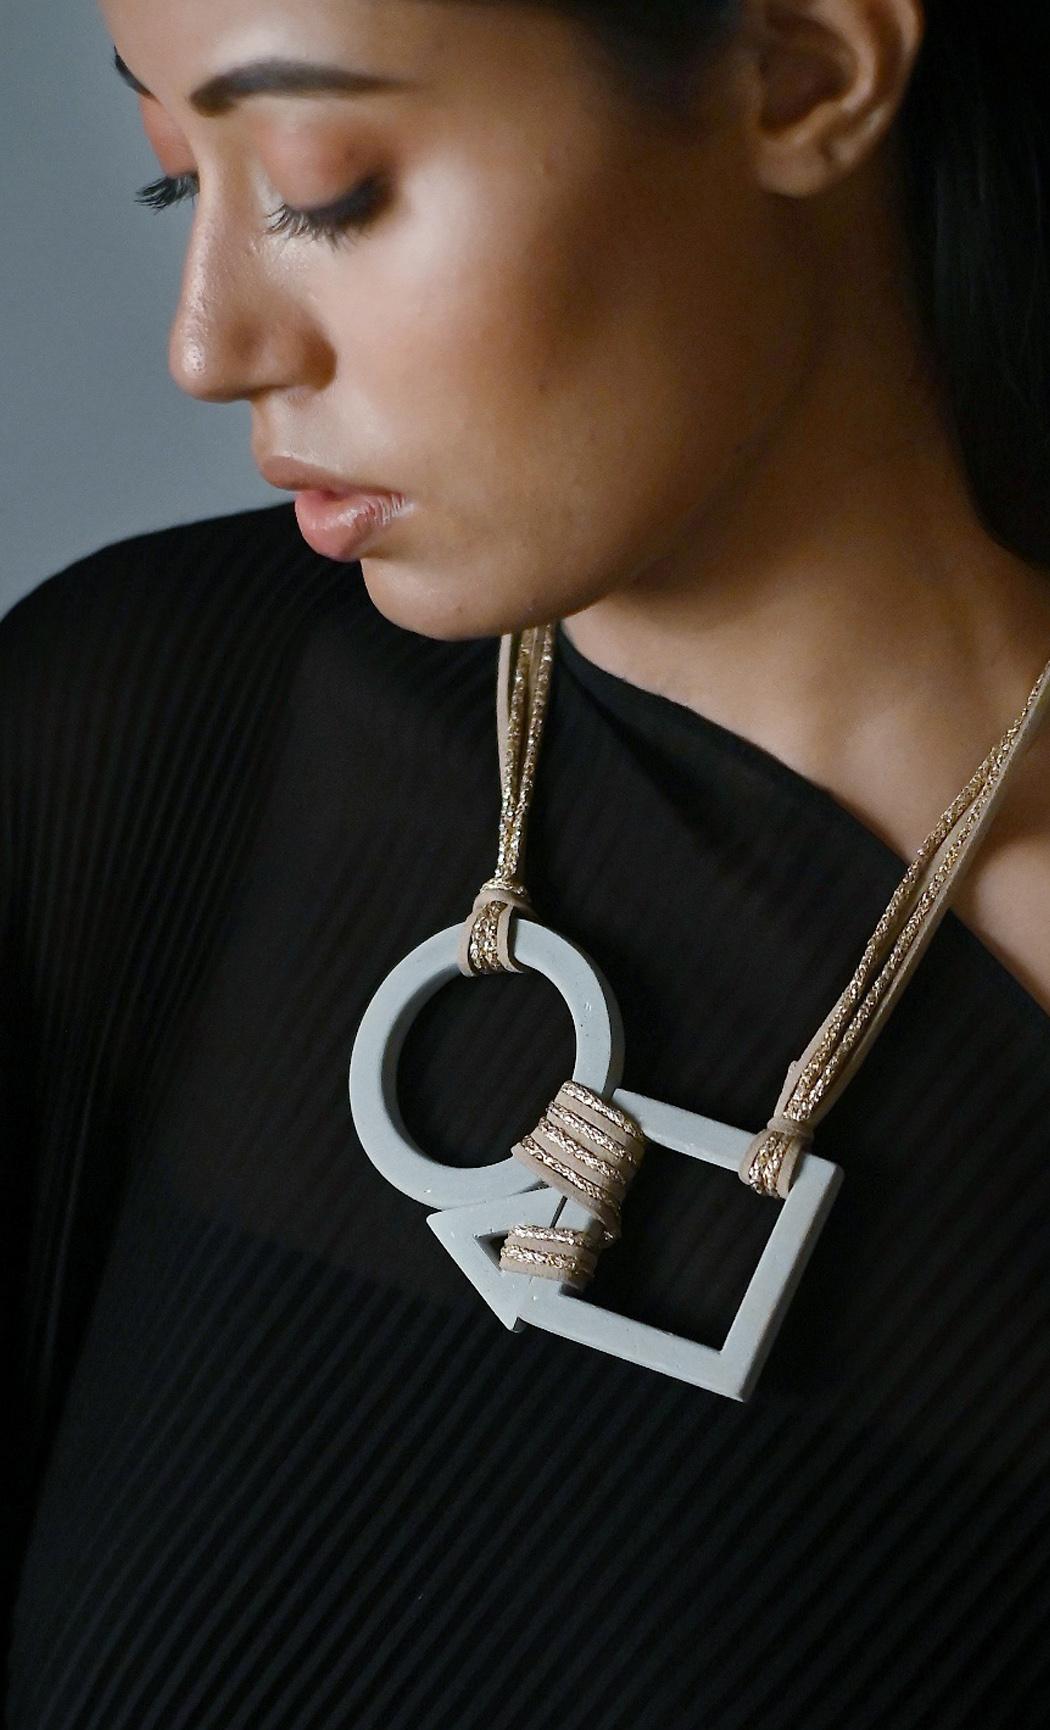 Grey Balbis Long Statement Necklace - Buy Online